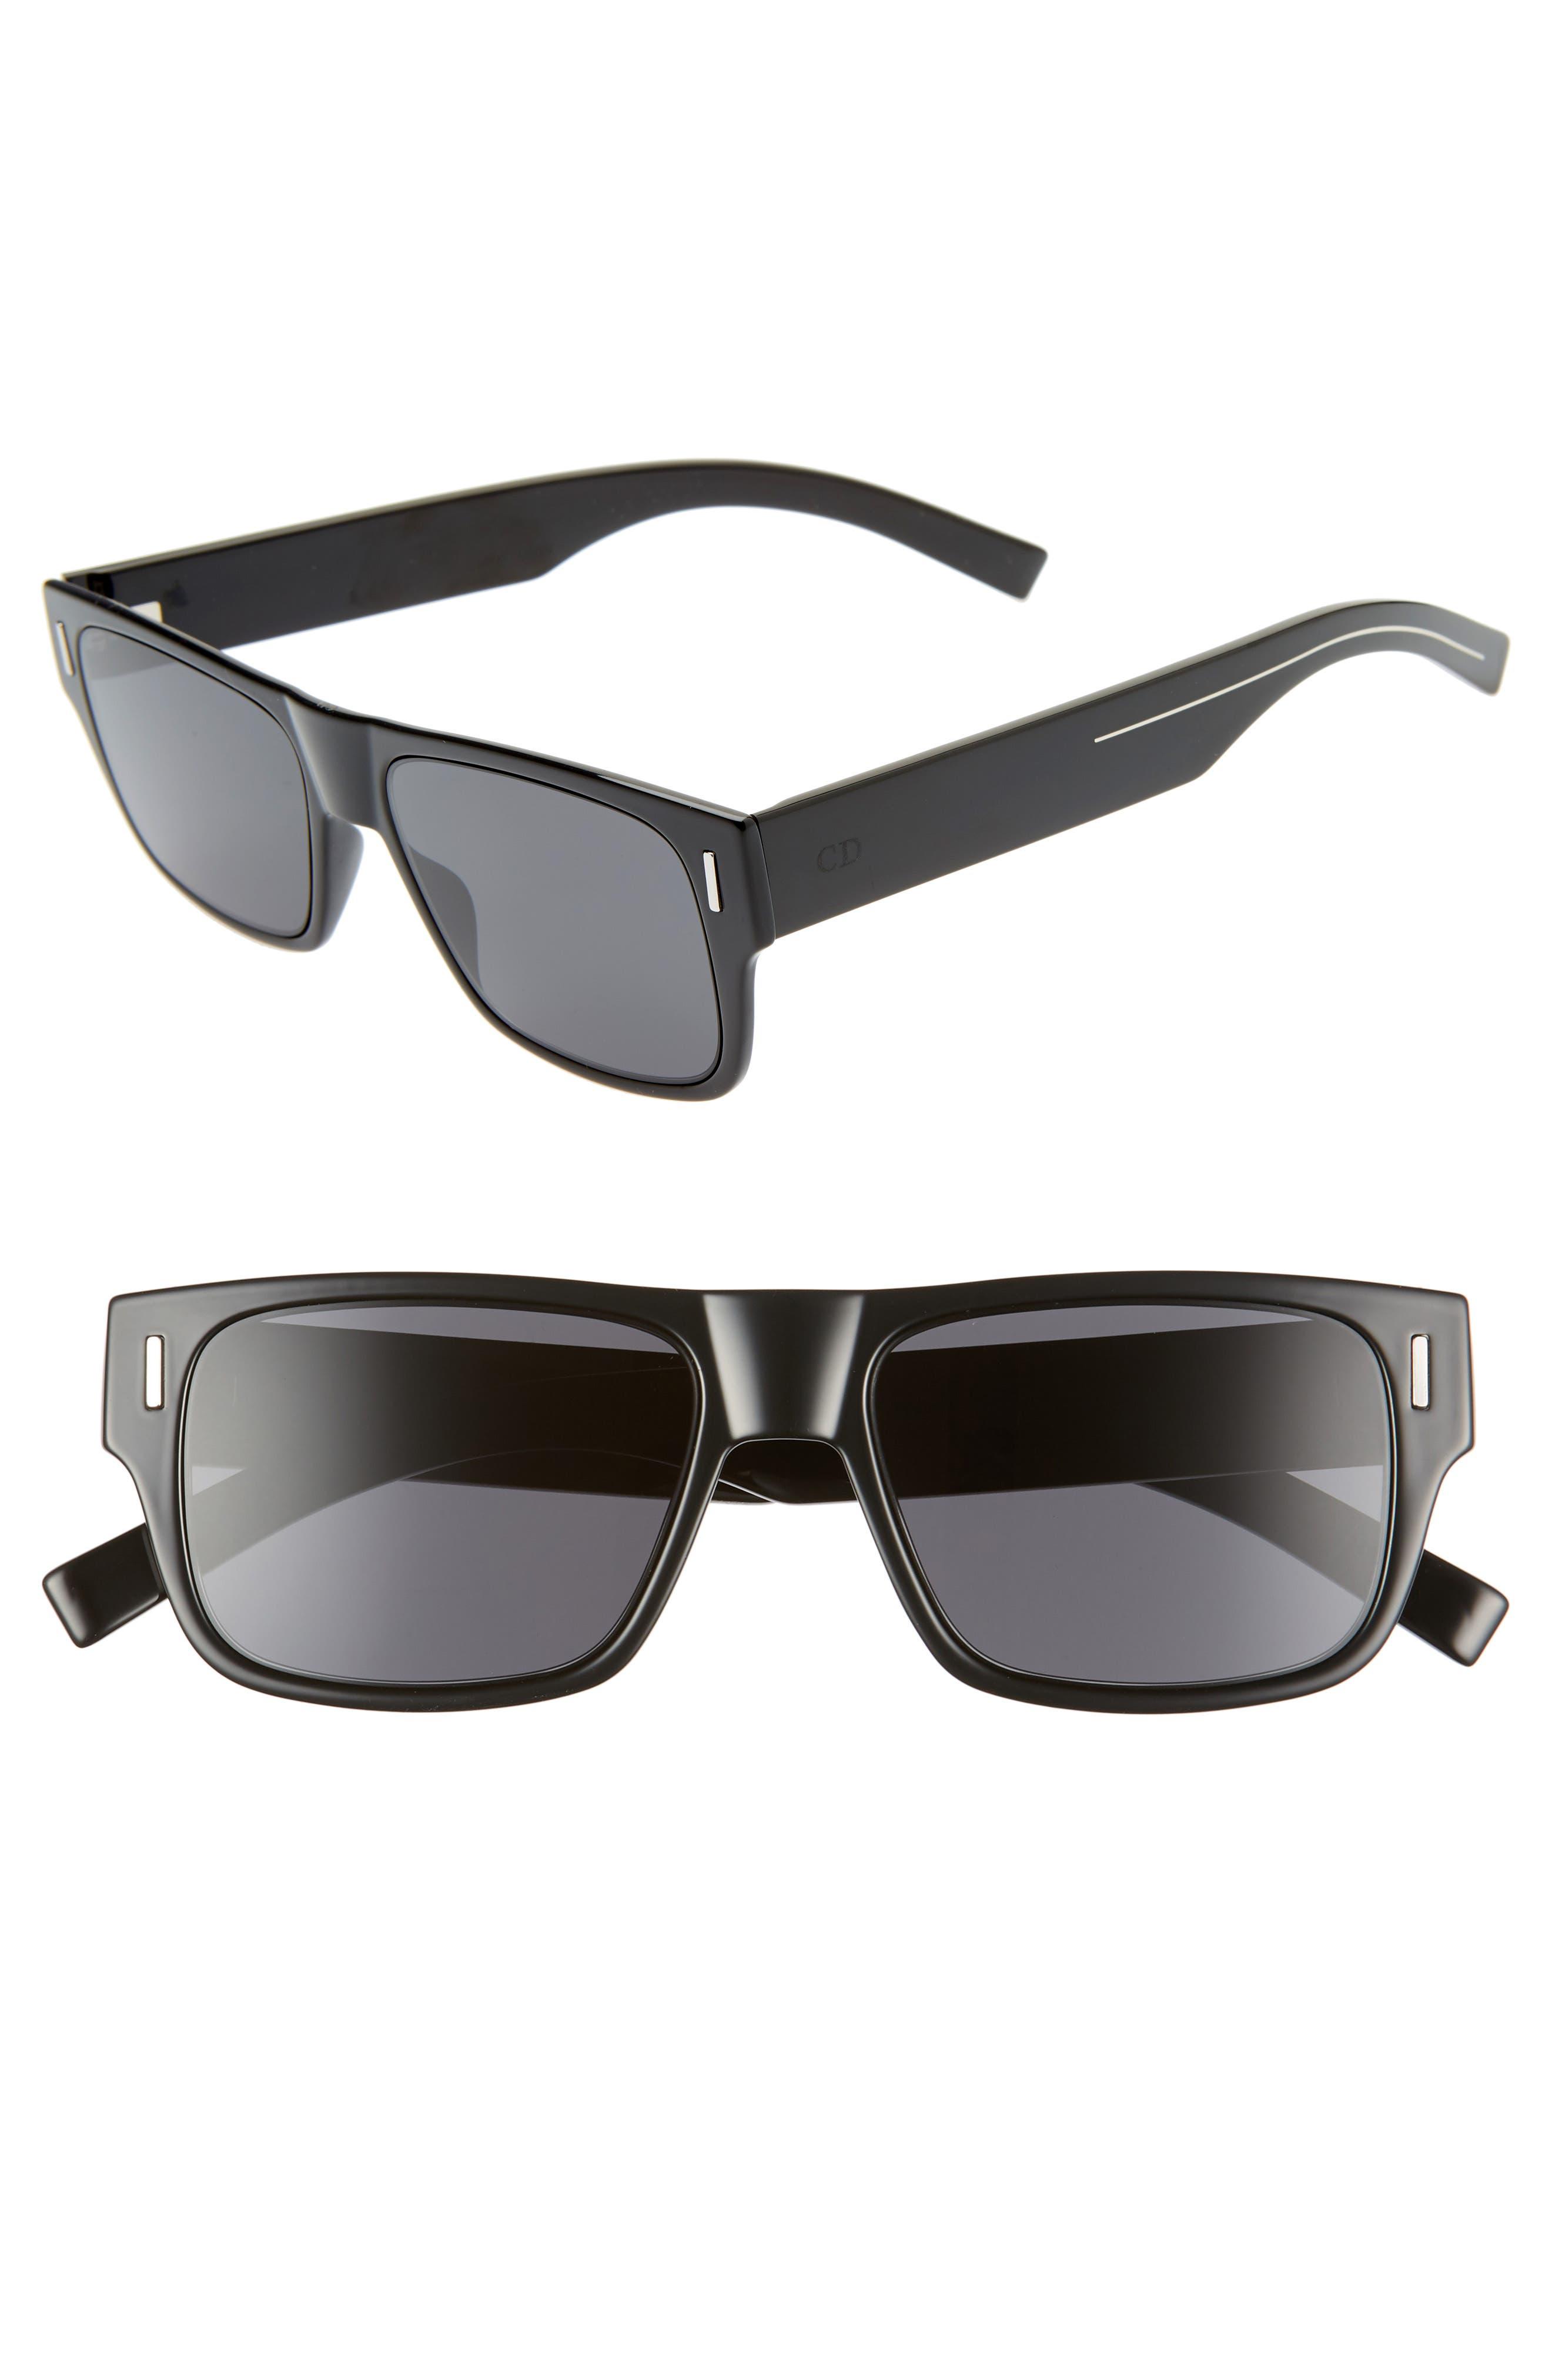 Dior Sunglasses Fraction4 54mm Rectangular Sunglasses